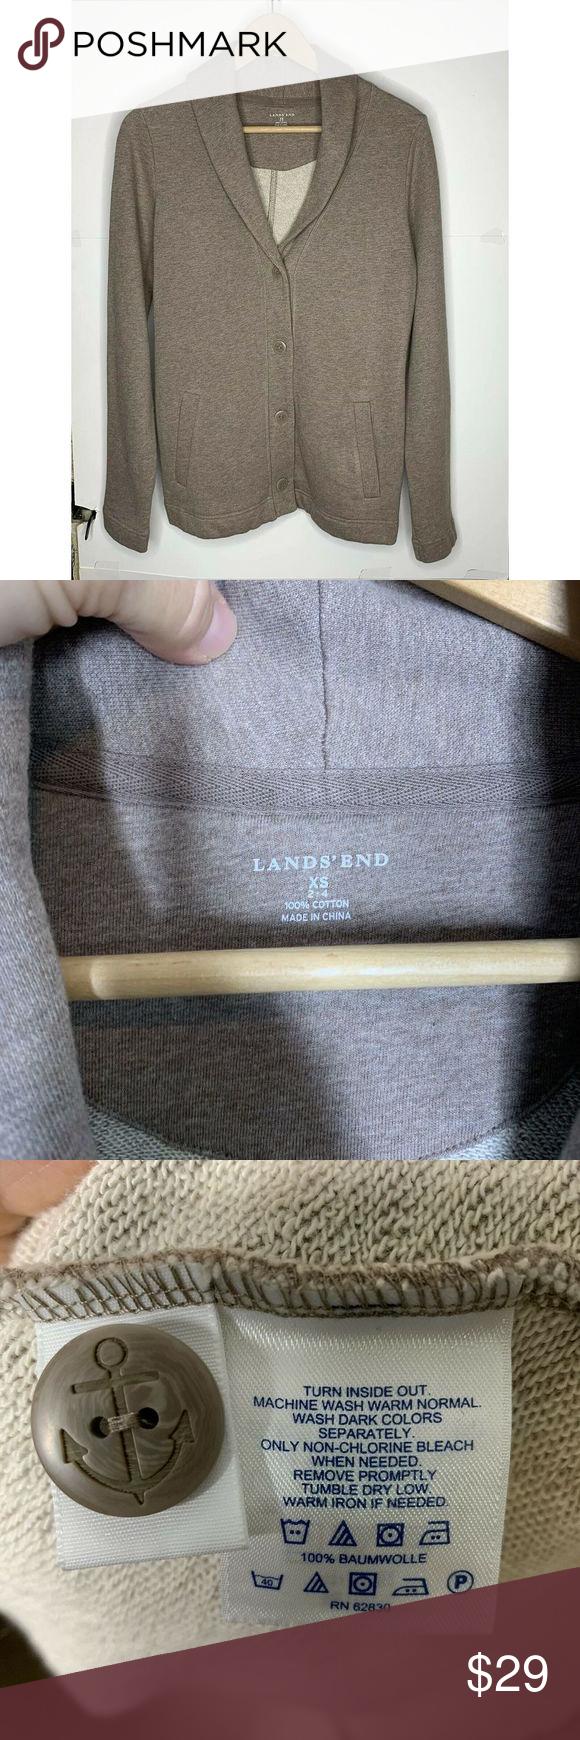 Lands End Womens Sweatshirt Cardigan Xs 2 4 Brown Sweatshirts Women Cardigan Sweatshirts Sweatshirts [ 1740 x 580 Pixel ]